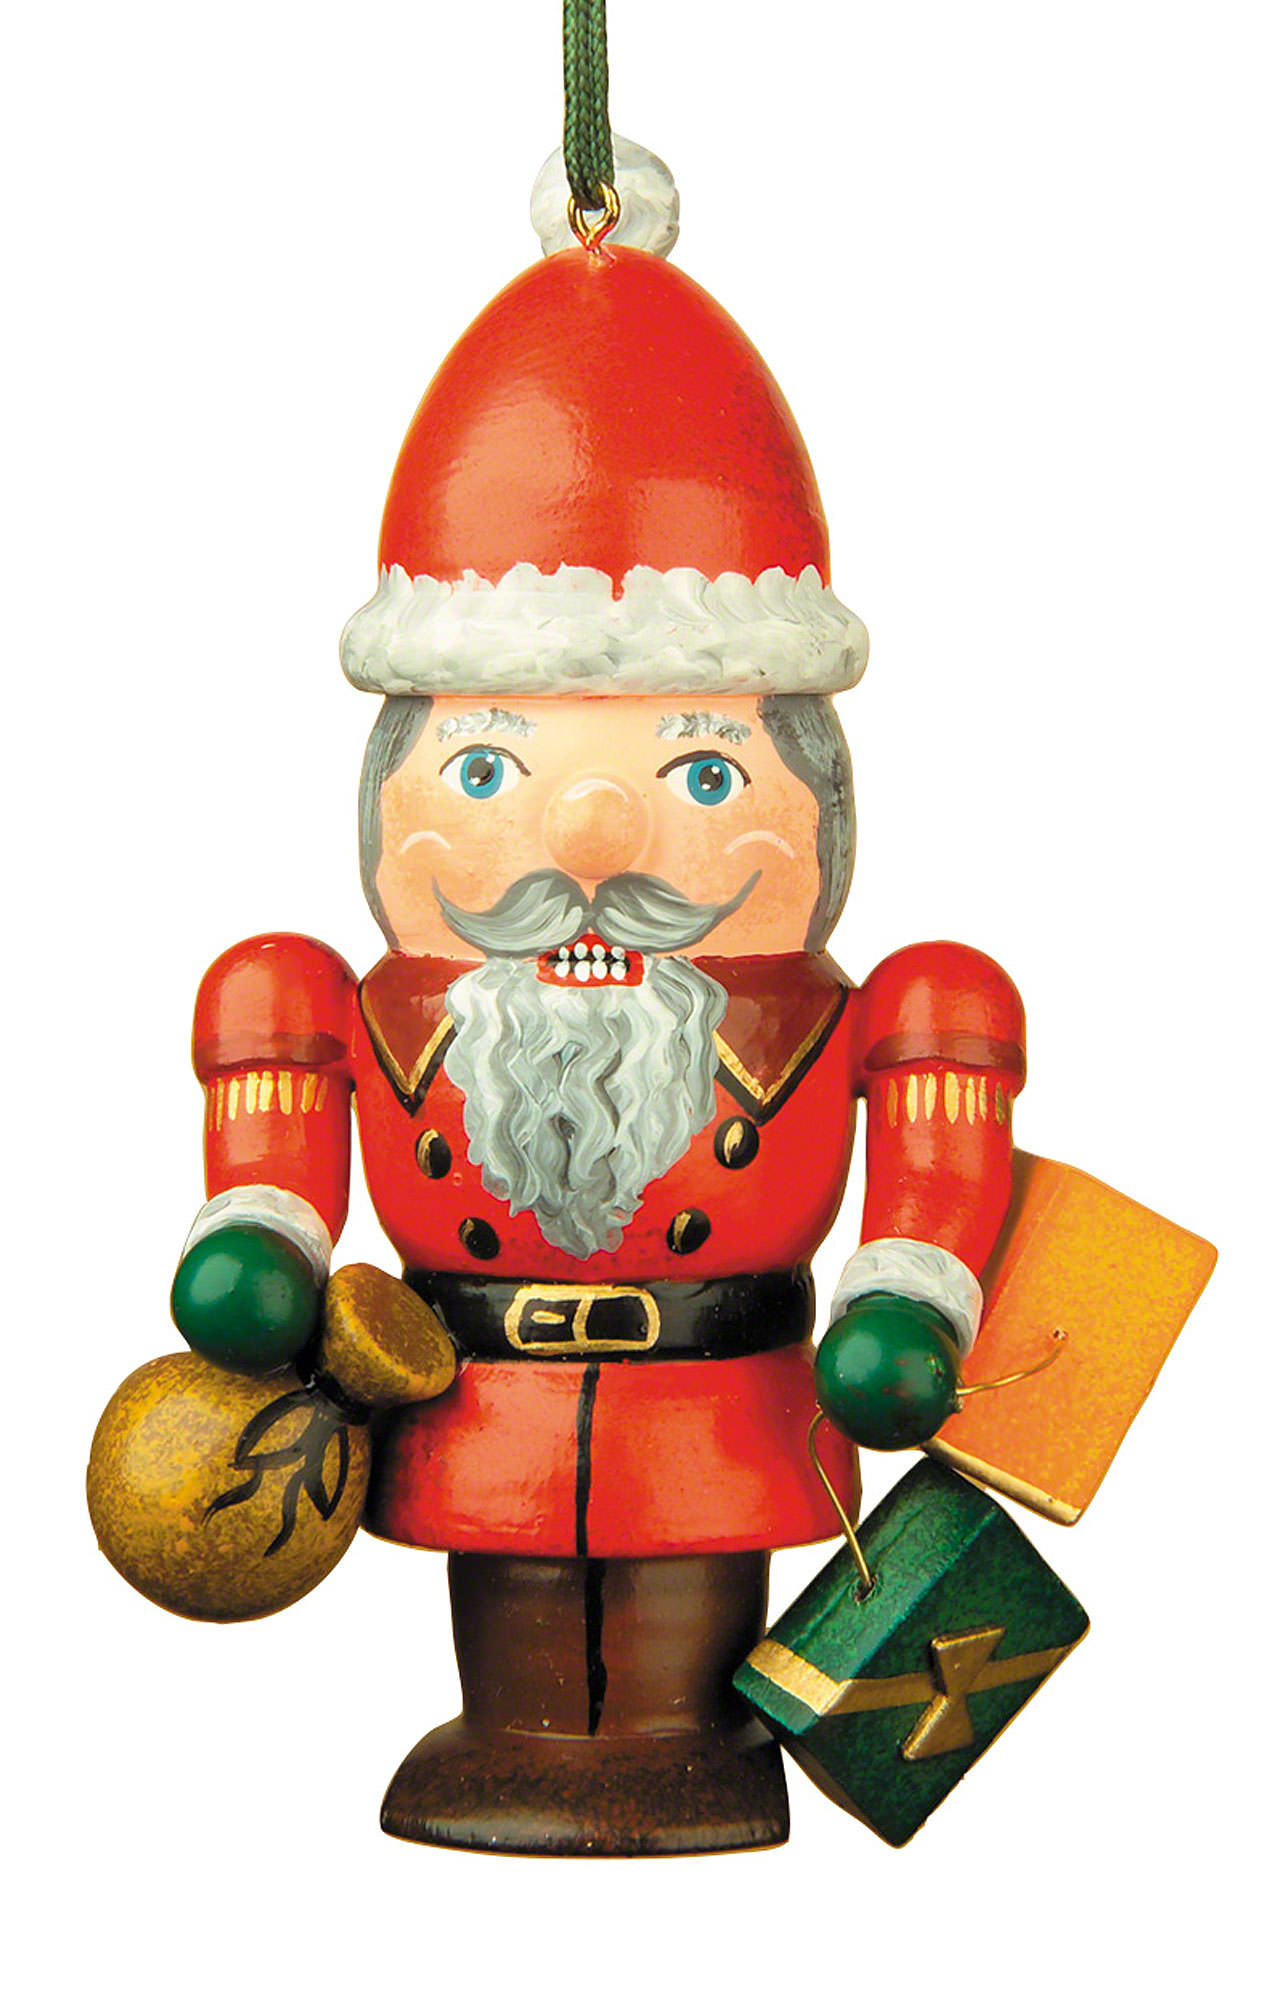 Tree Ornament - Nutcracker Santa (7 cm/3in) by Hubrig Volkskunst